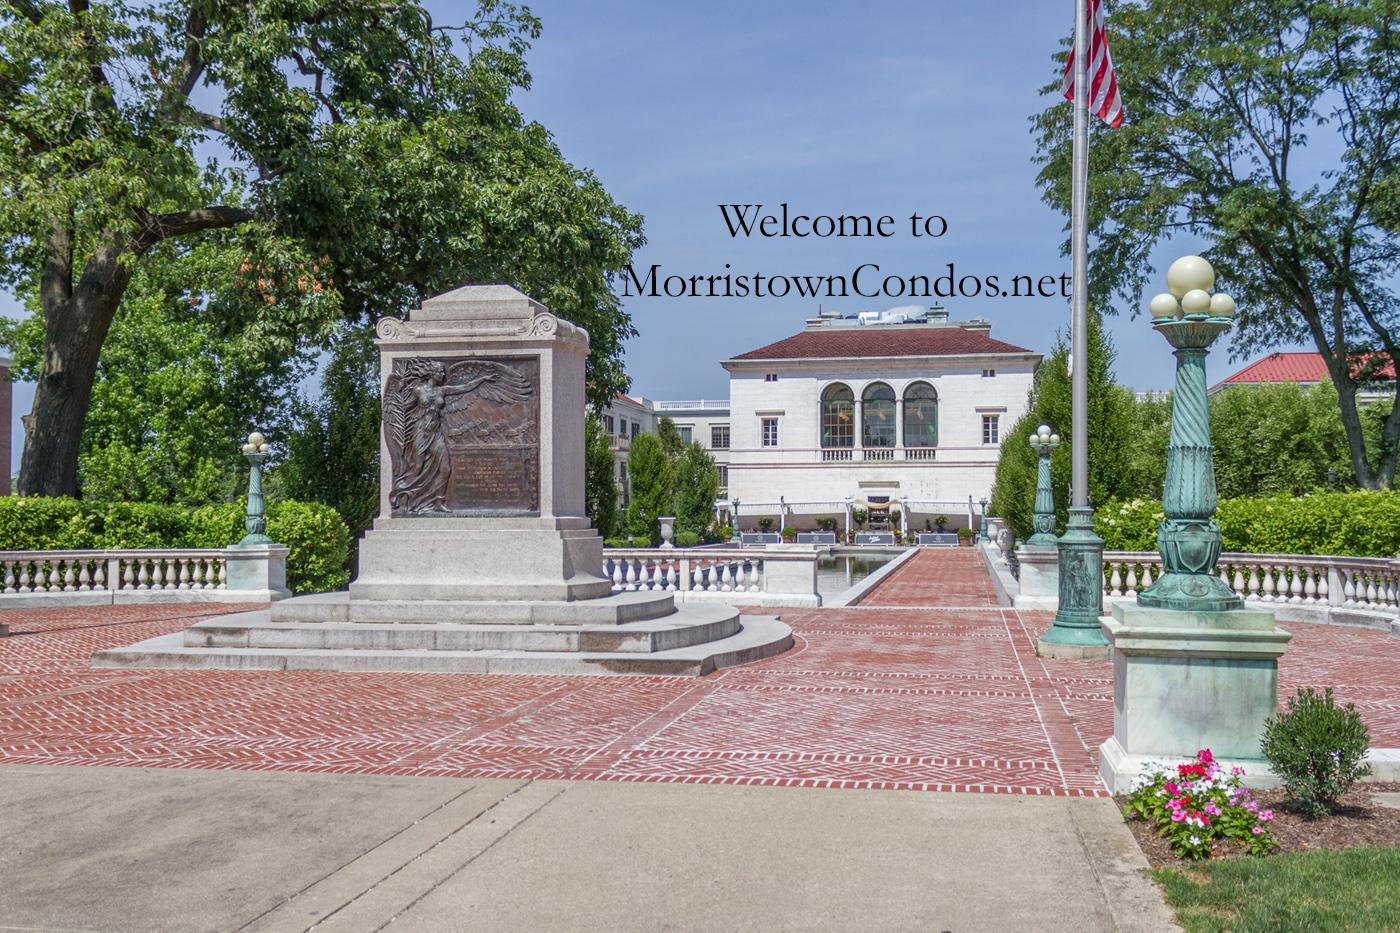 Morristowncondos.net